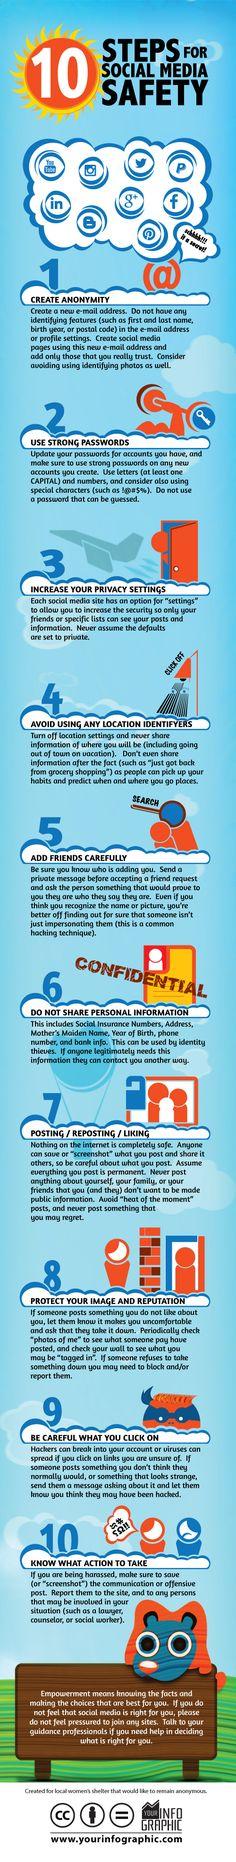 10 Steps for Social Media safety #infografia #infographic #socialmedia